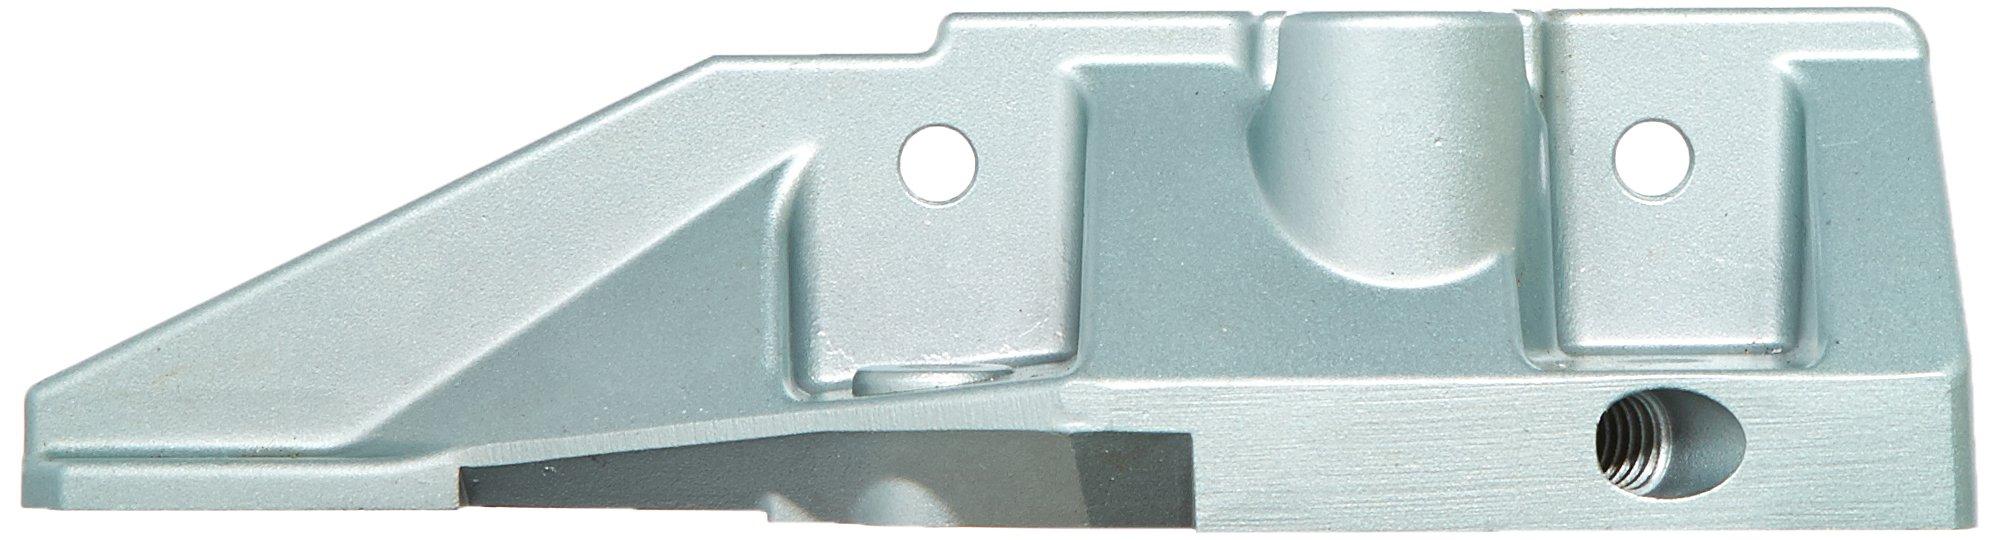 Hitachi 307220 Fence C10Fs C8Fb2 C8Fb Replacement Part